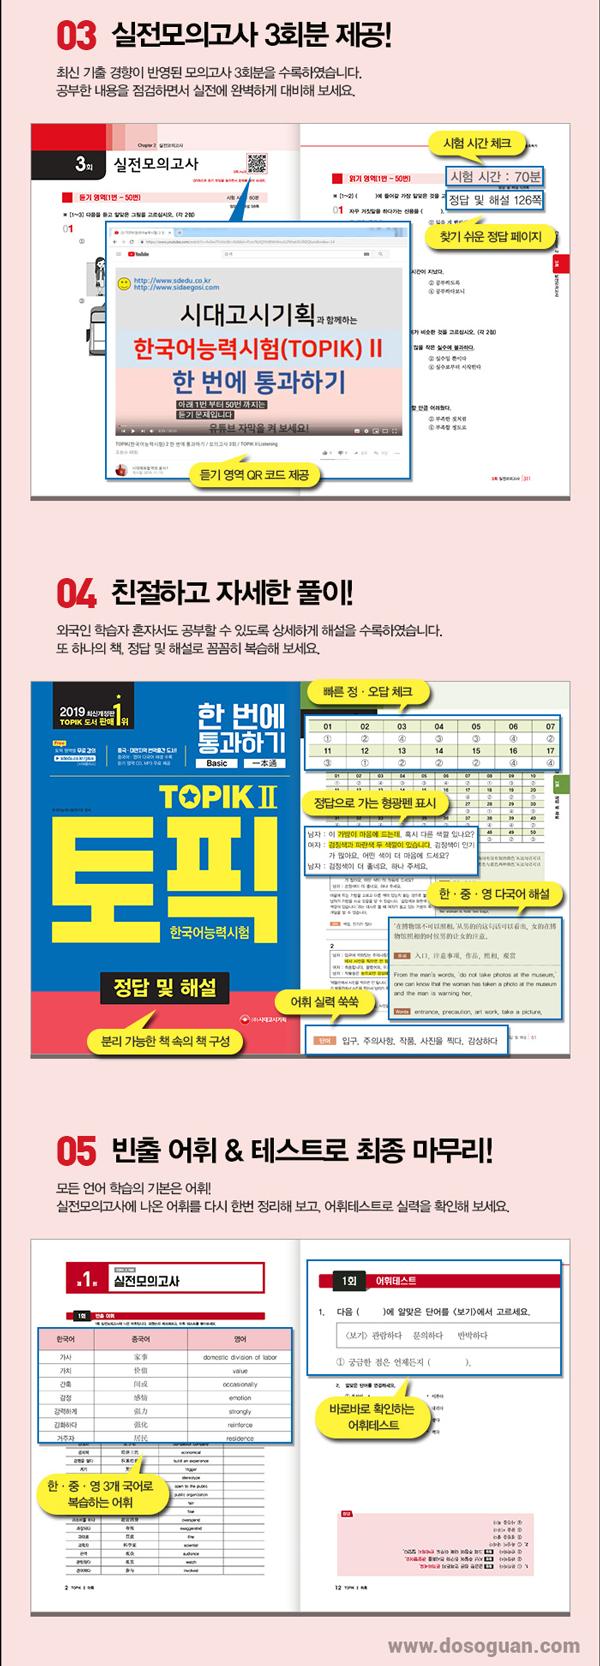 Korean-Exam-Topik-2019-korean-books-Dosoguan-bookstore-purchase-online